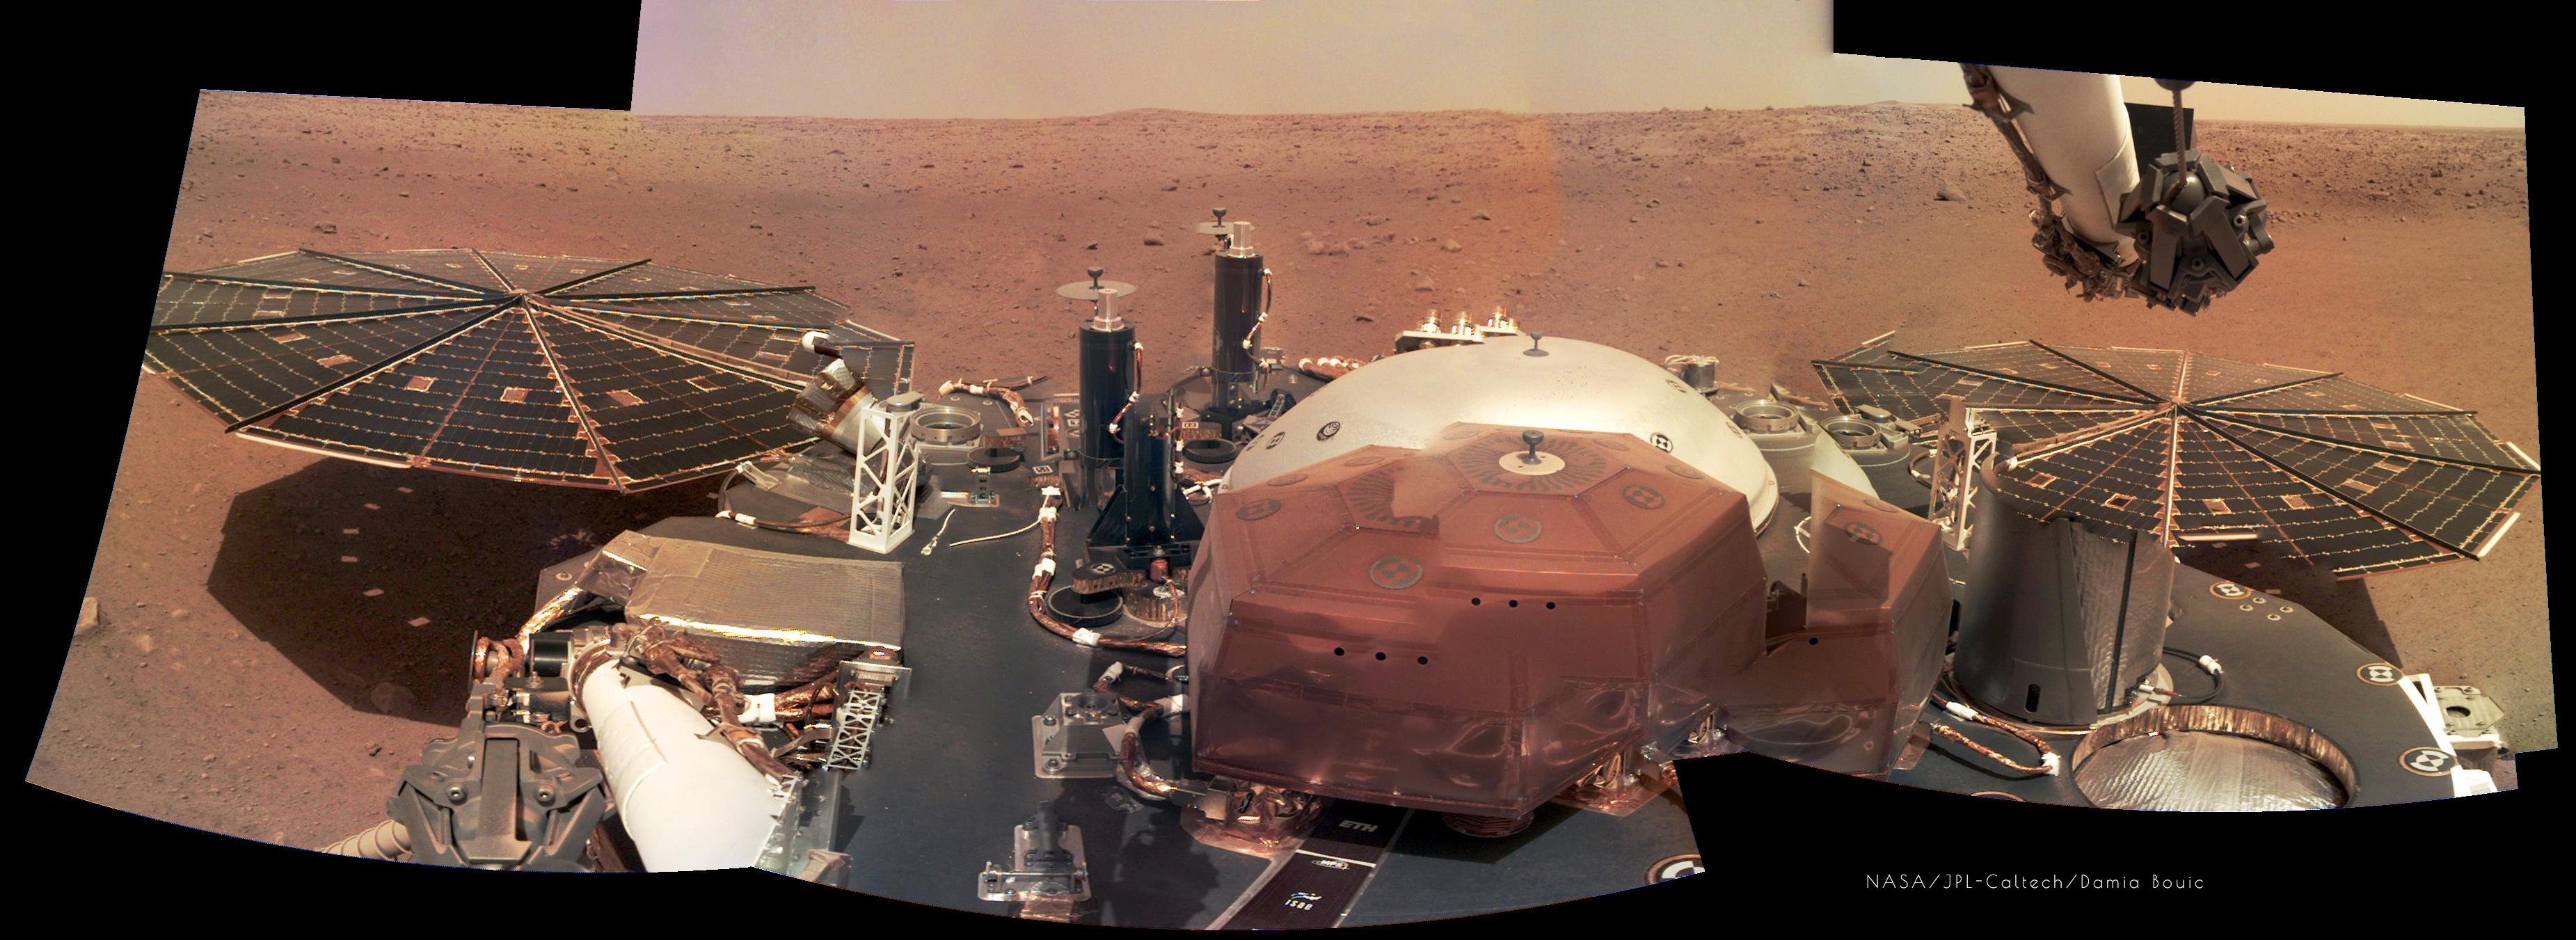 bbc news mars insight landing - photo #35